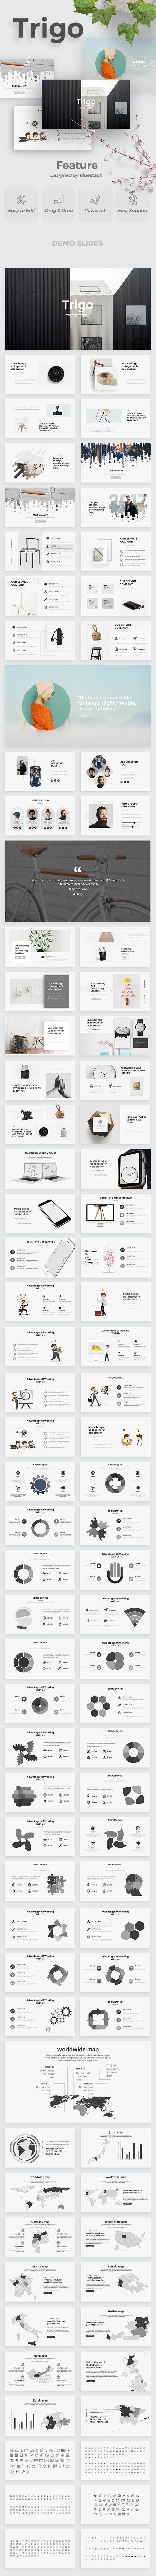 Trigo Minimal Powerpoint Template - Creative PowerPoint Templates